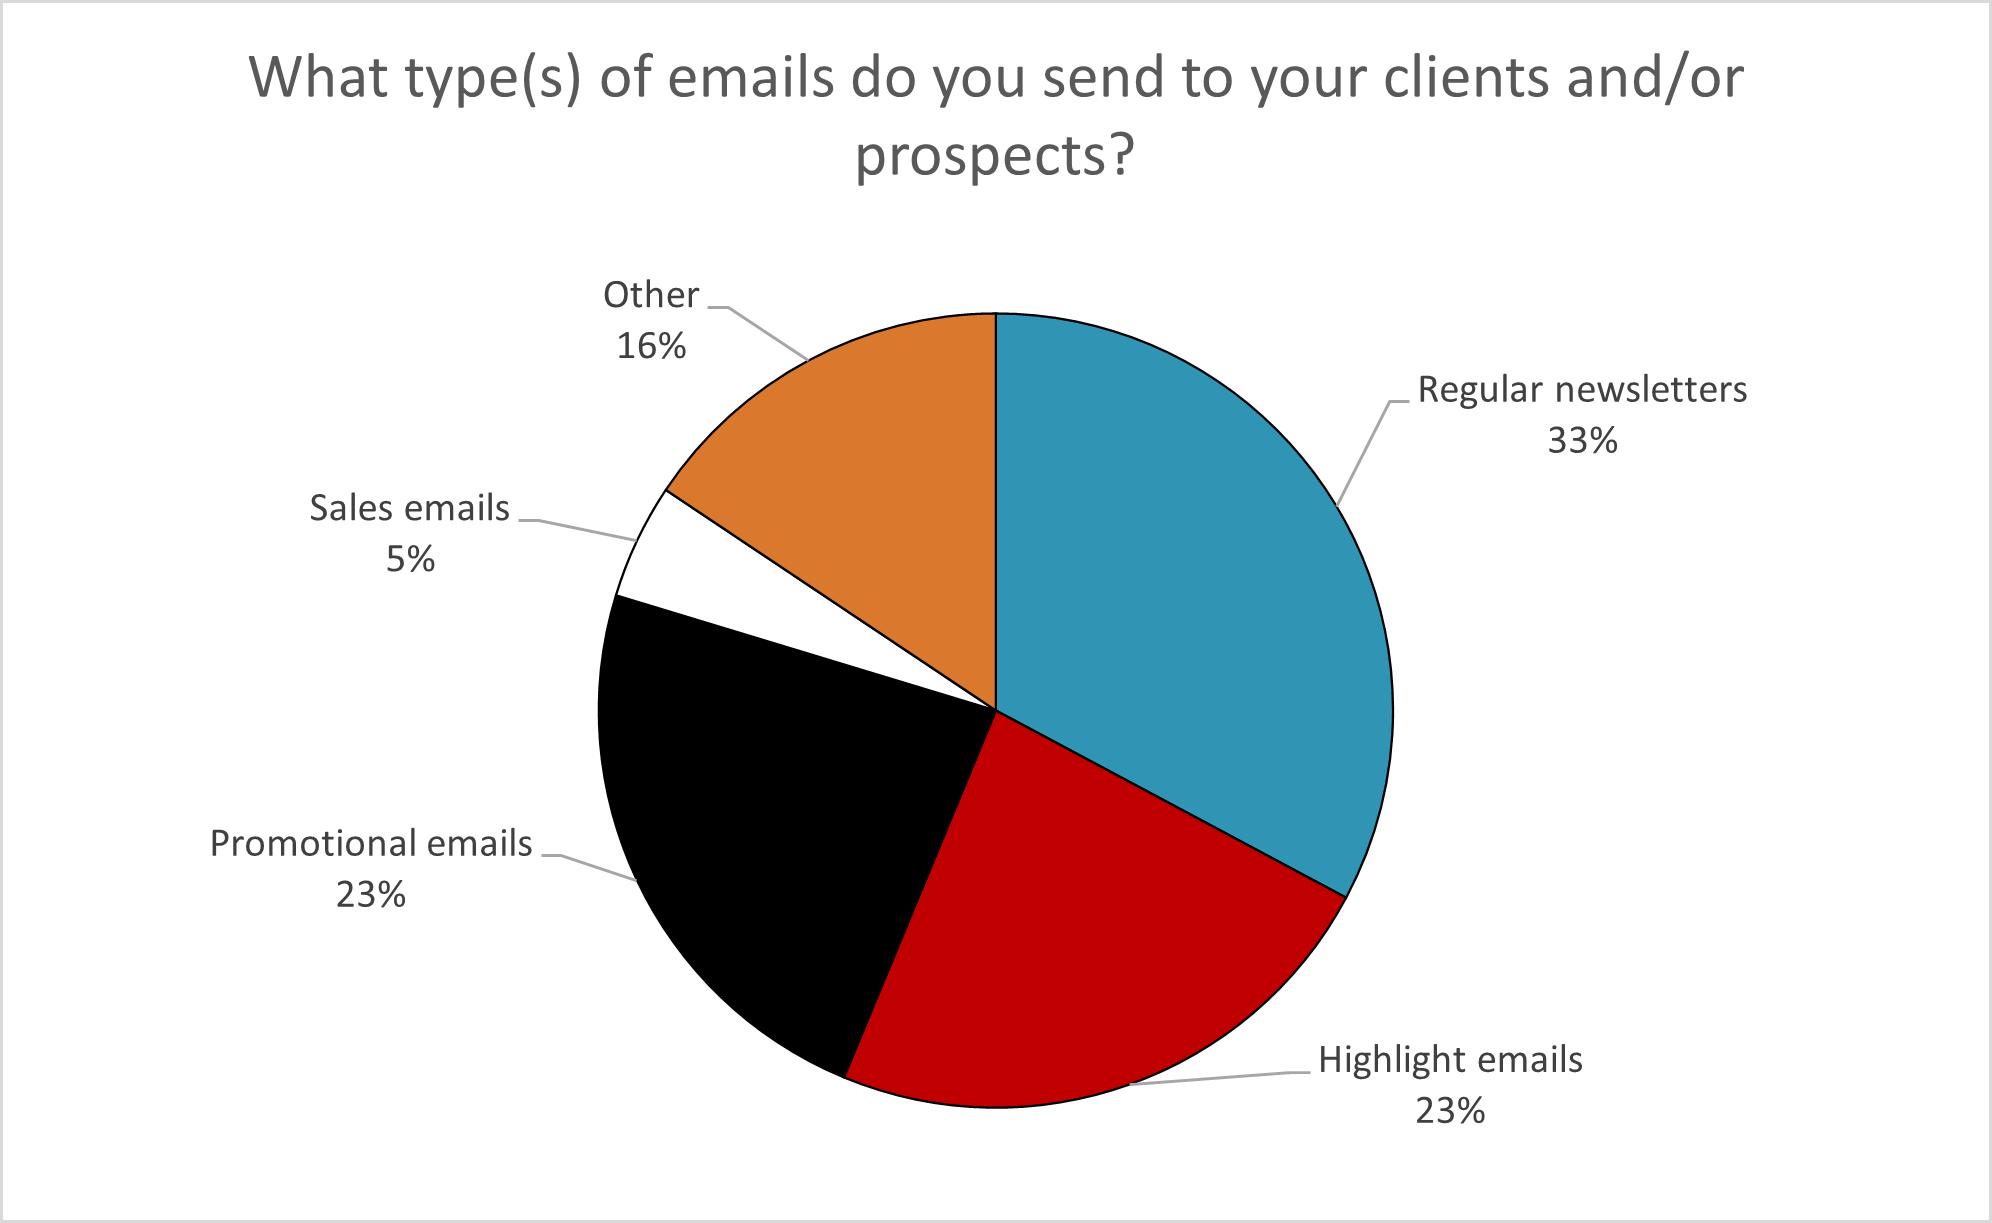 Email Survey Image 3